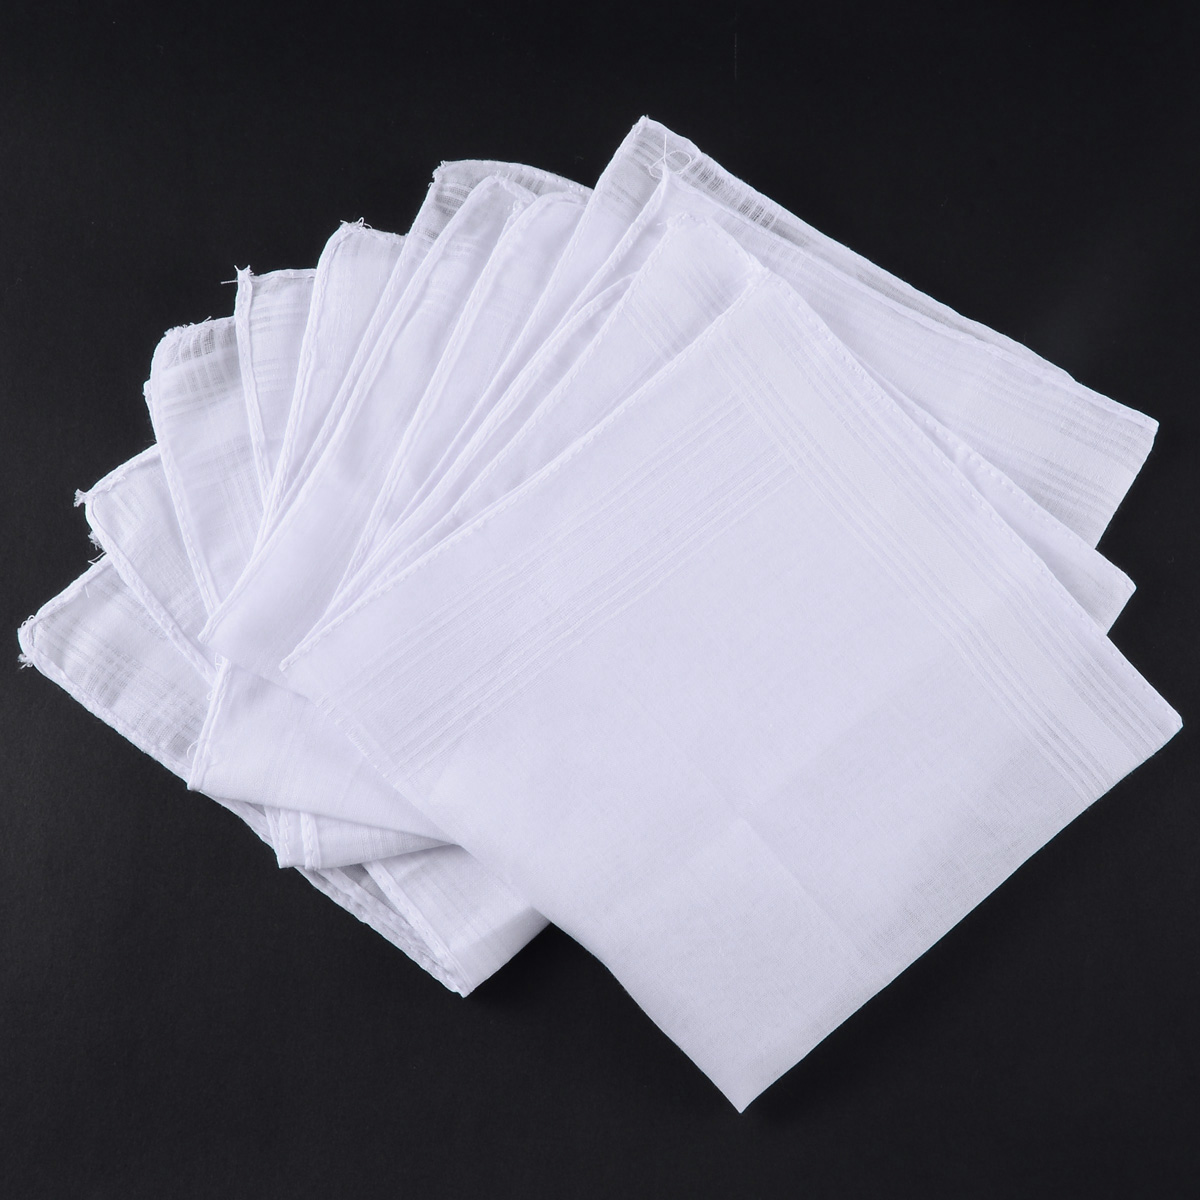 5pcs White Pocket Cotton Solid Handkerchiefs Hankie Hanky With Stripe Men 40*40cm Squares Hanky Party Vintage Gift Hankies